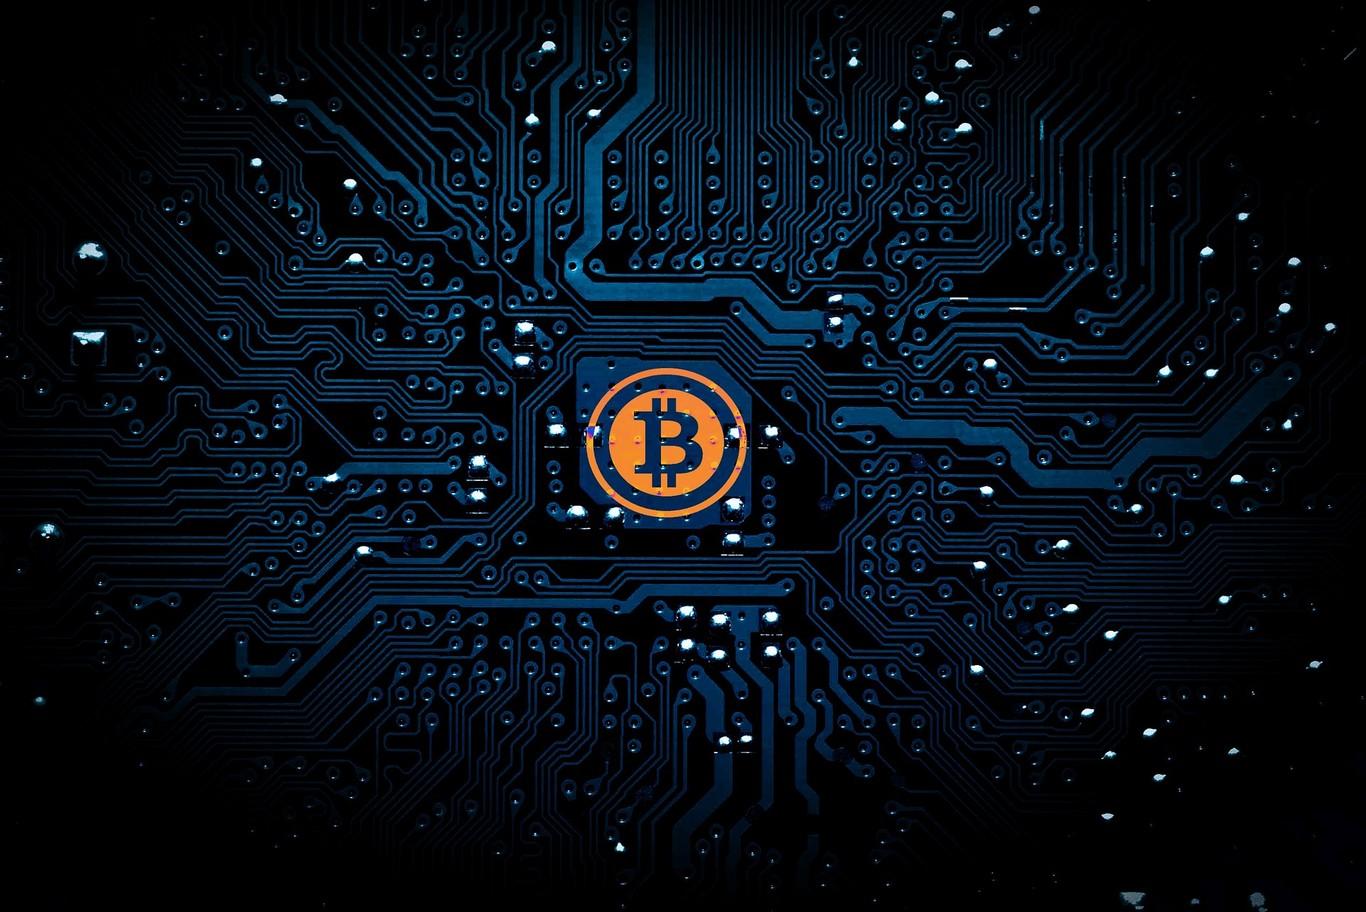 Bitcoin y Criptomonedas cover image